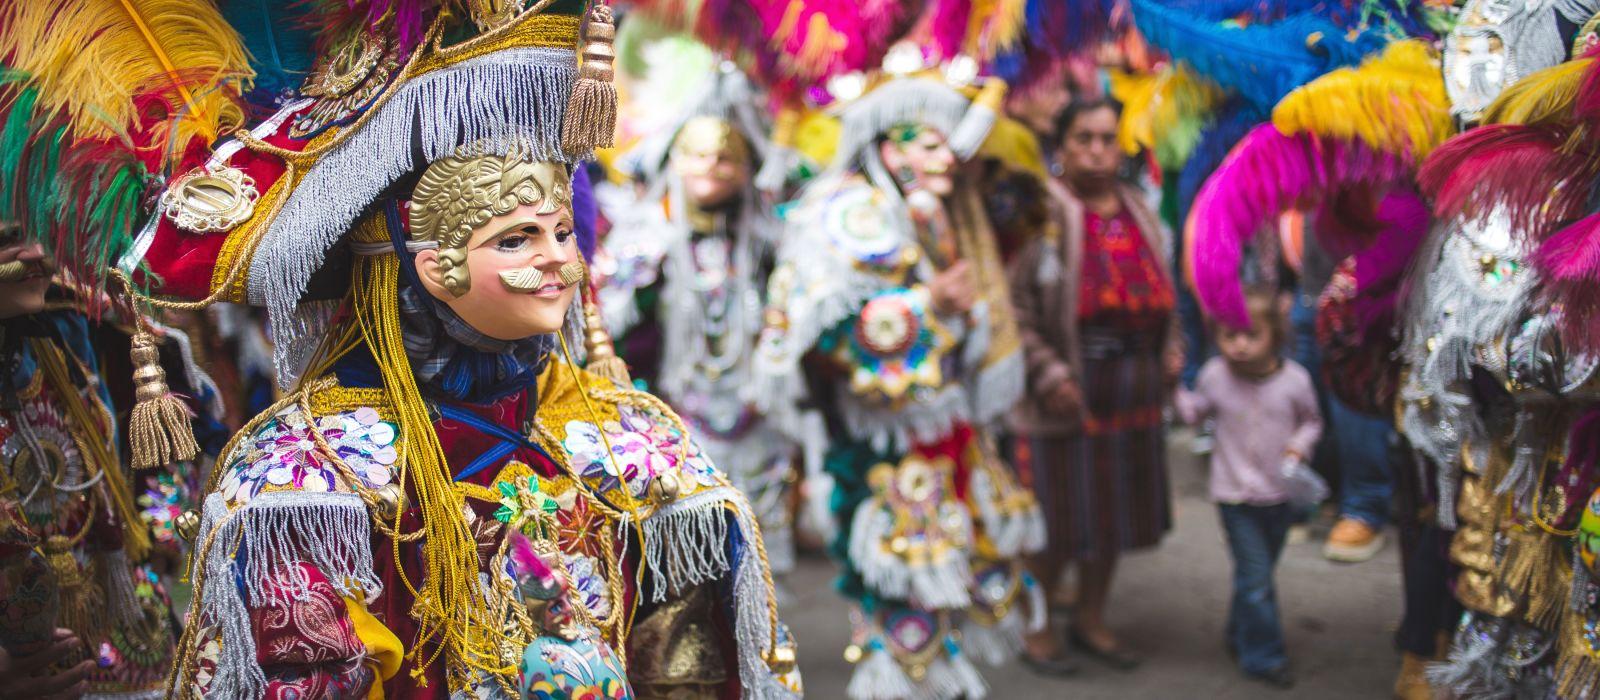 Traditional festival and colors in Chichicastenango, Guatemala, Central America